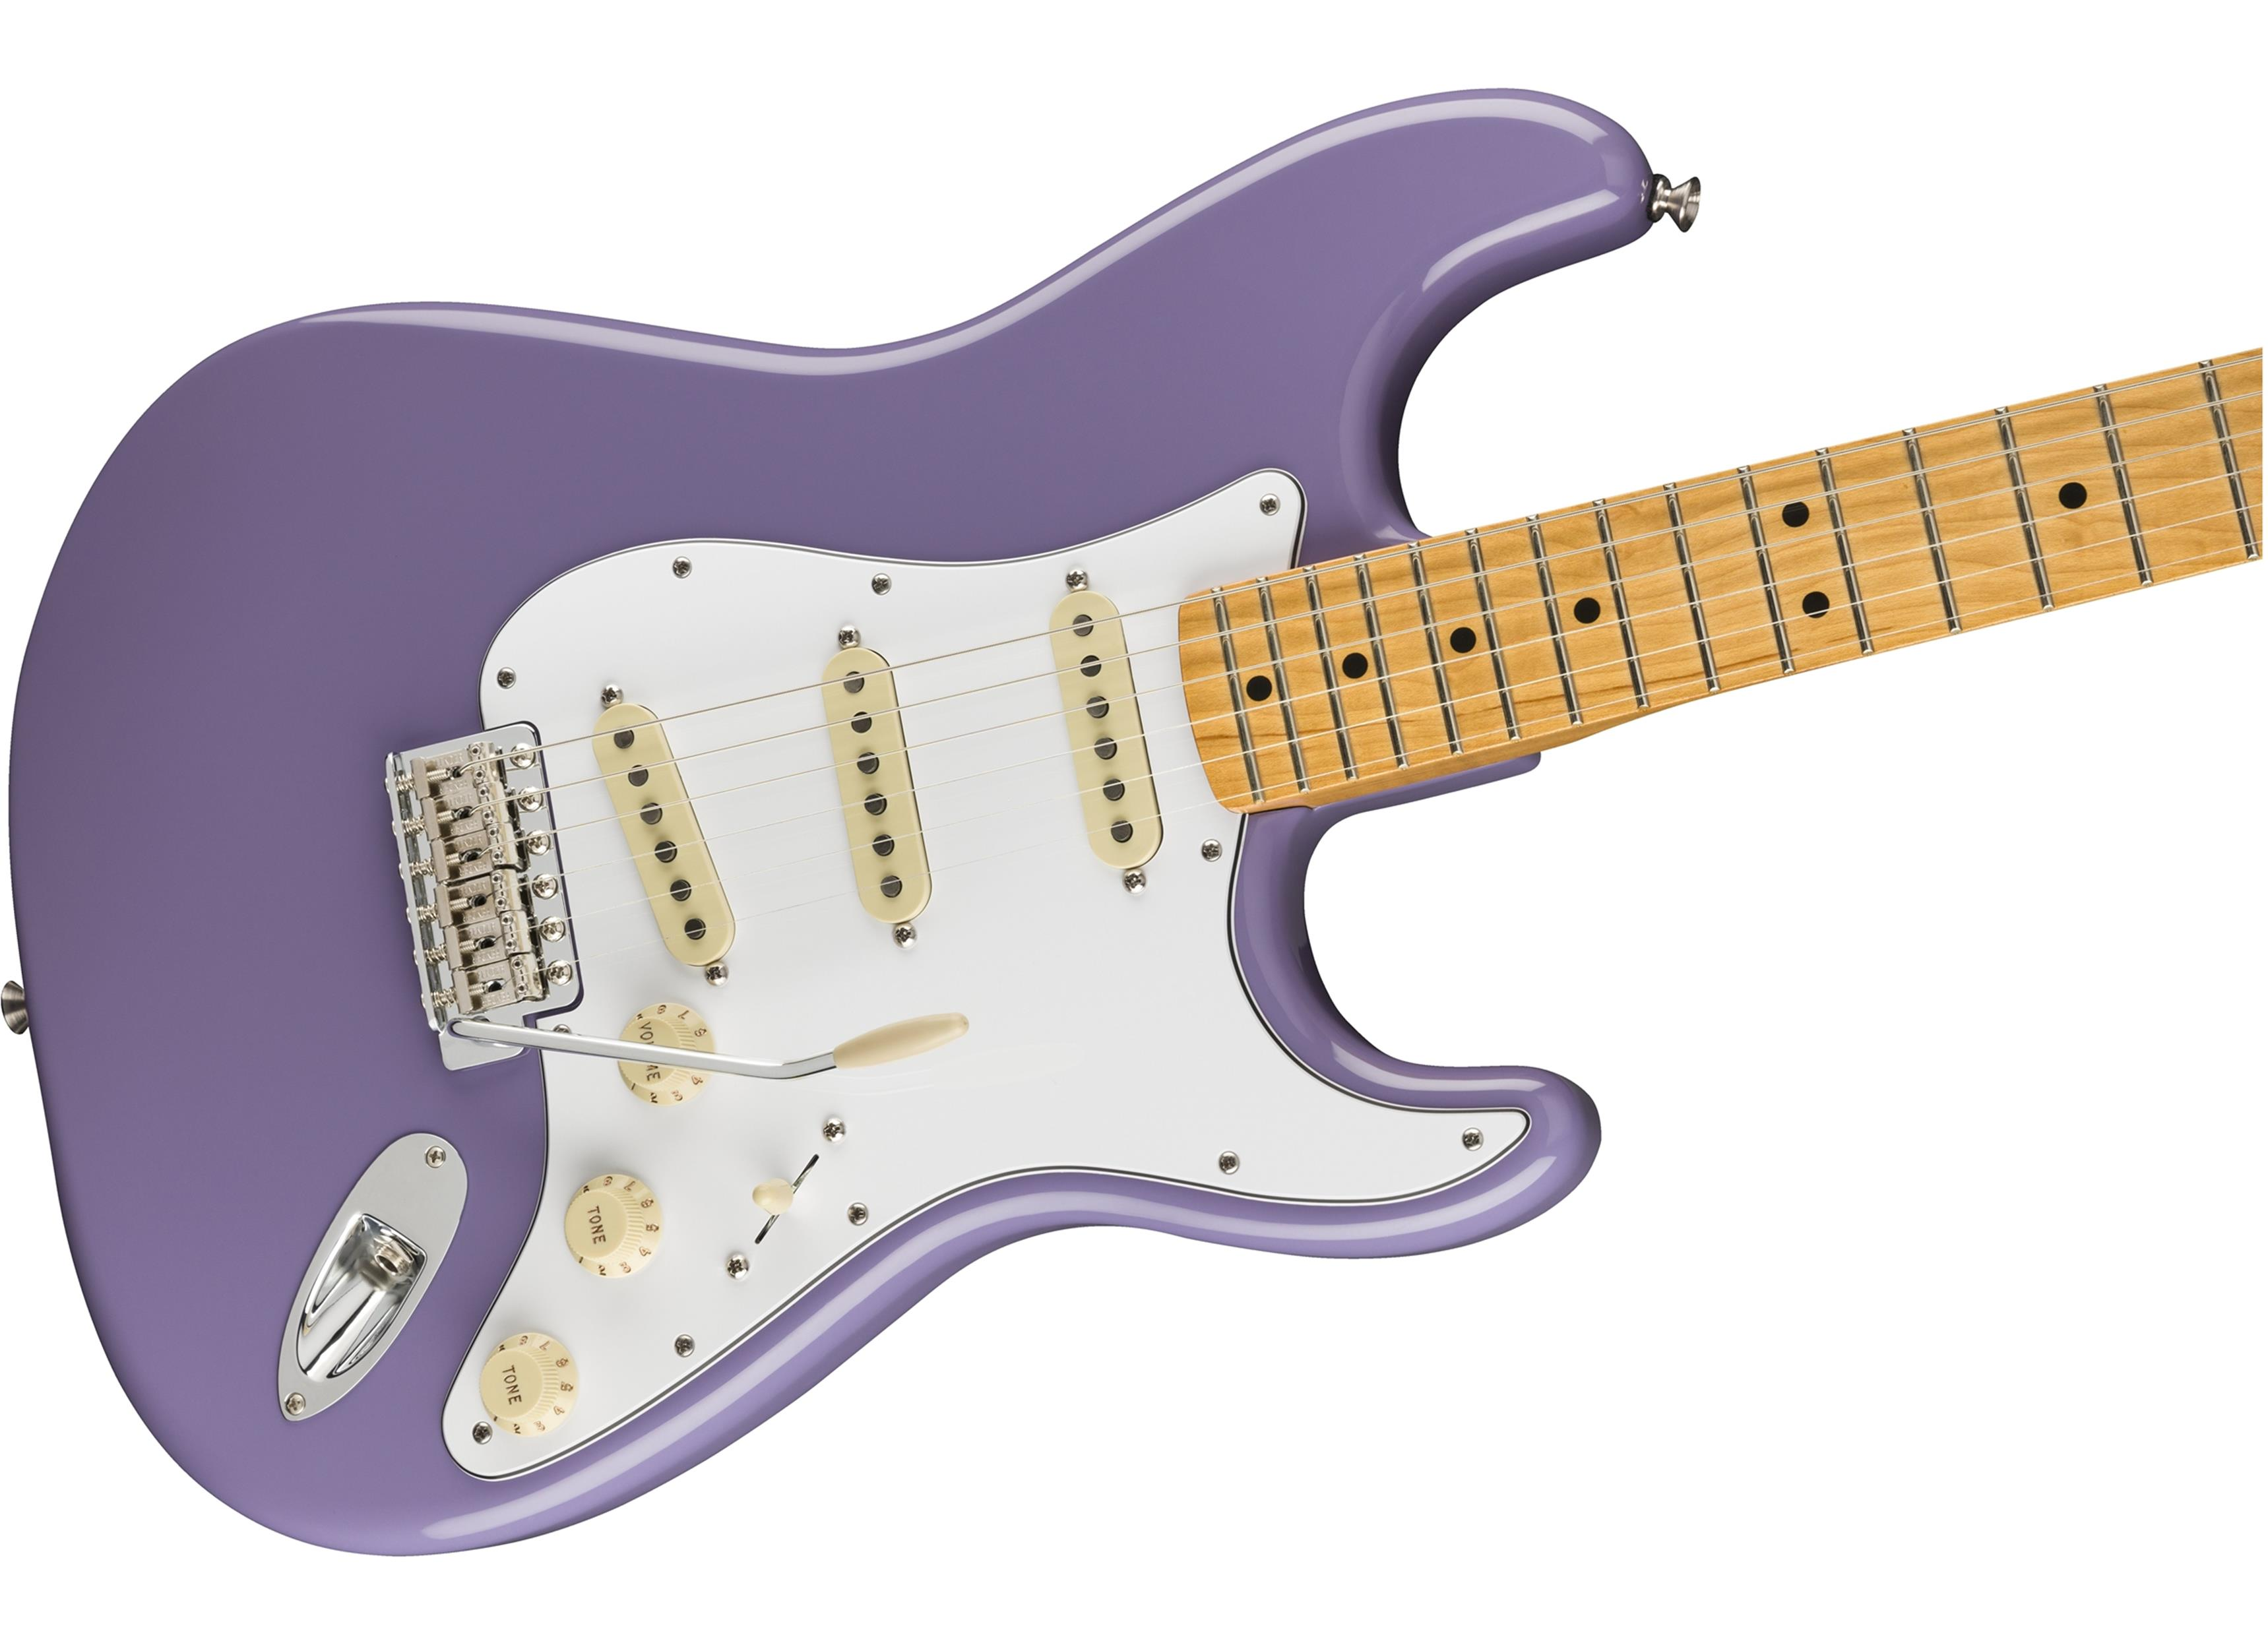 FENDER Jimi Hendrix Stratocaster MN Ultra Violet  0145802326 - Chitarre Chitarre - Elettriche